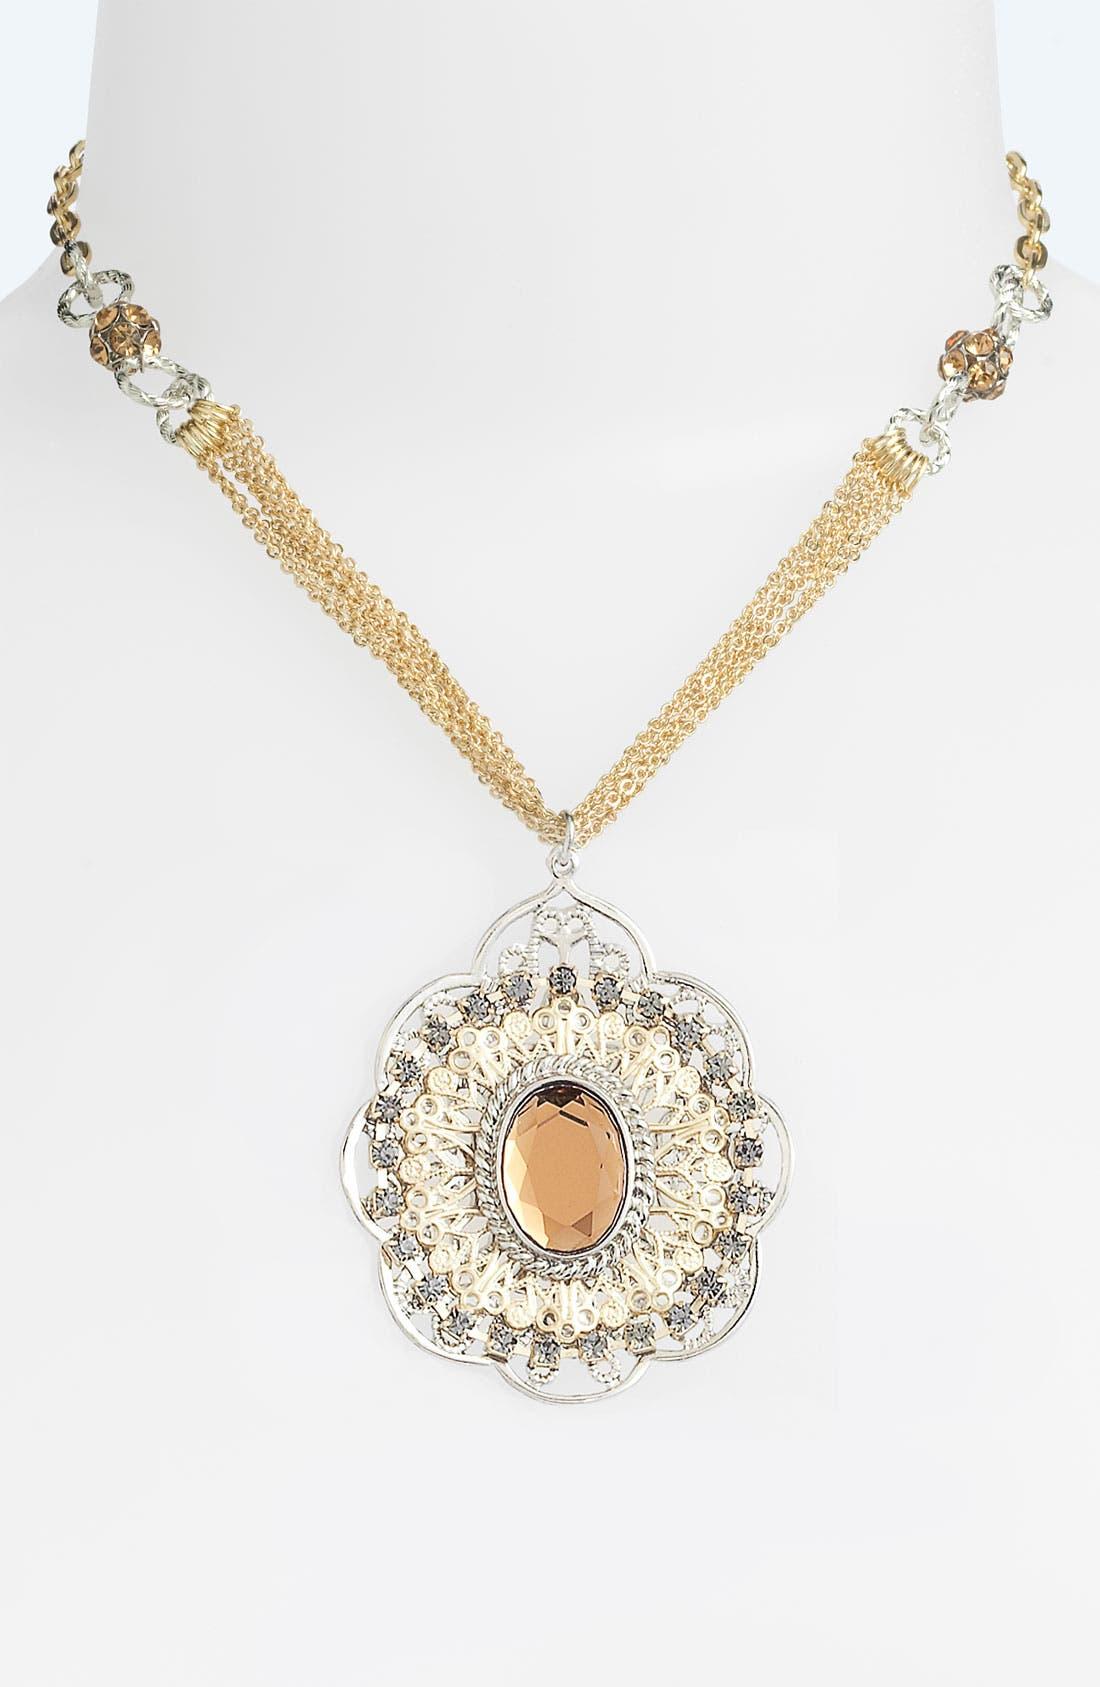 Main Image - Nordstrom 'Romantics' Pendant Necklace